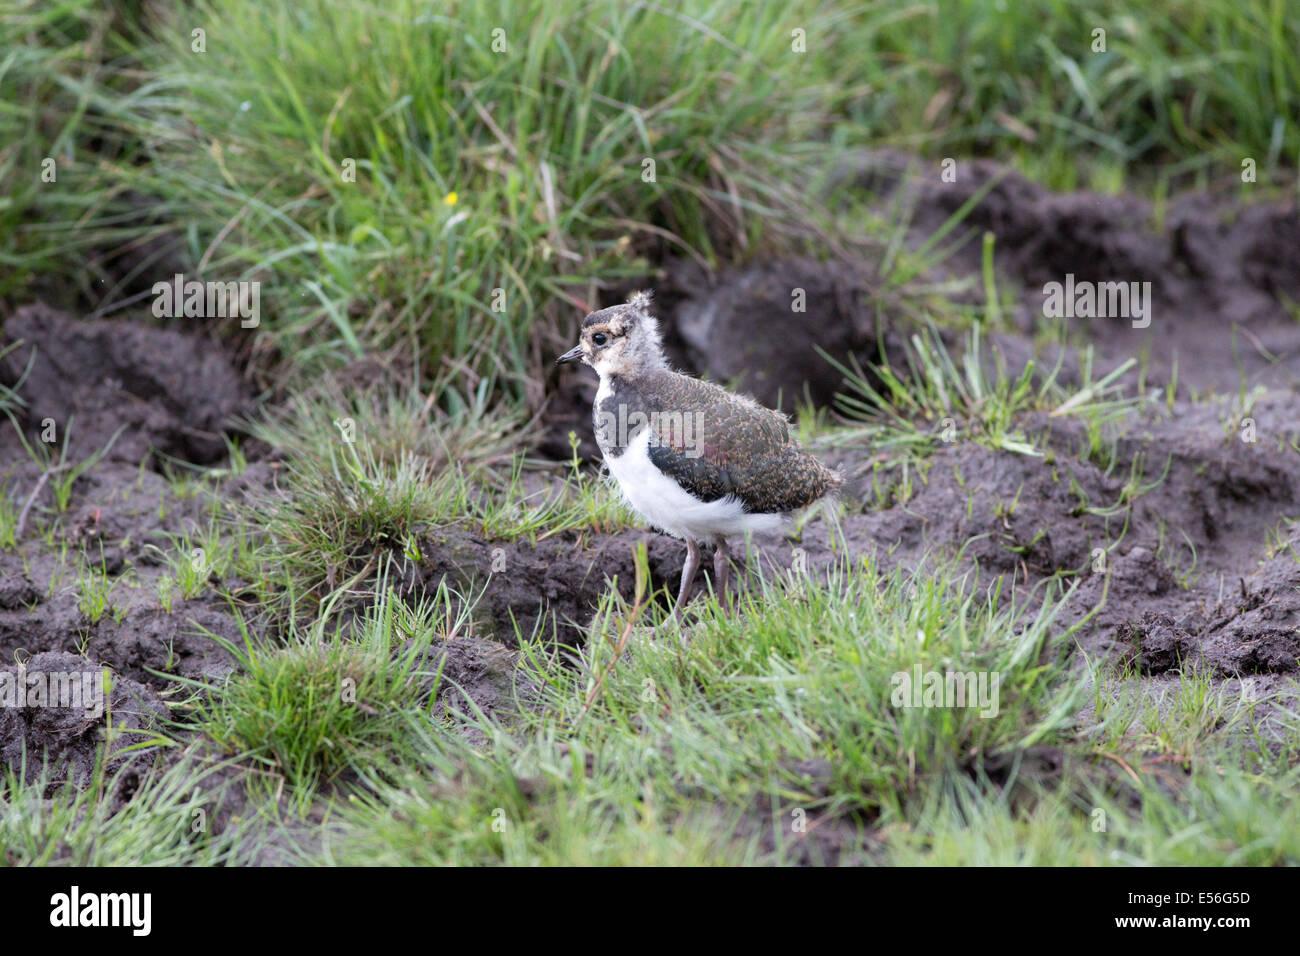 Lapwing or Peewit Highland Wildlife Park Kincraig Inverness Scotland Stock Photo